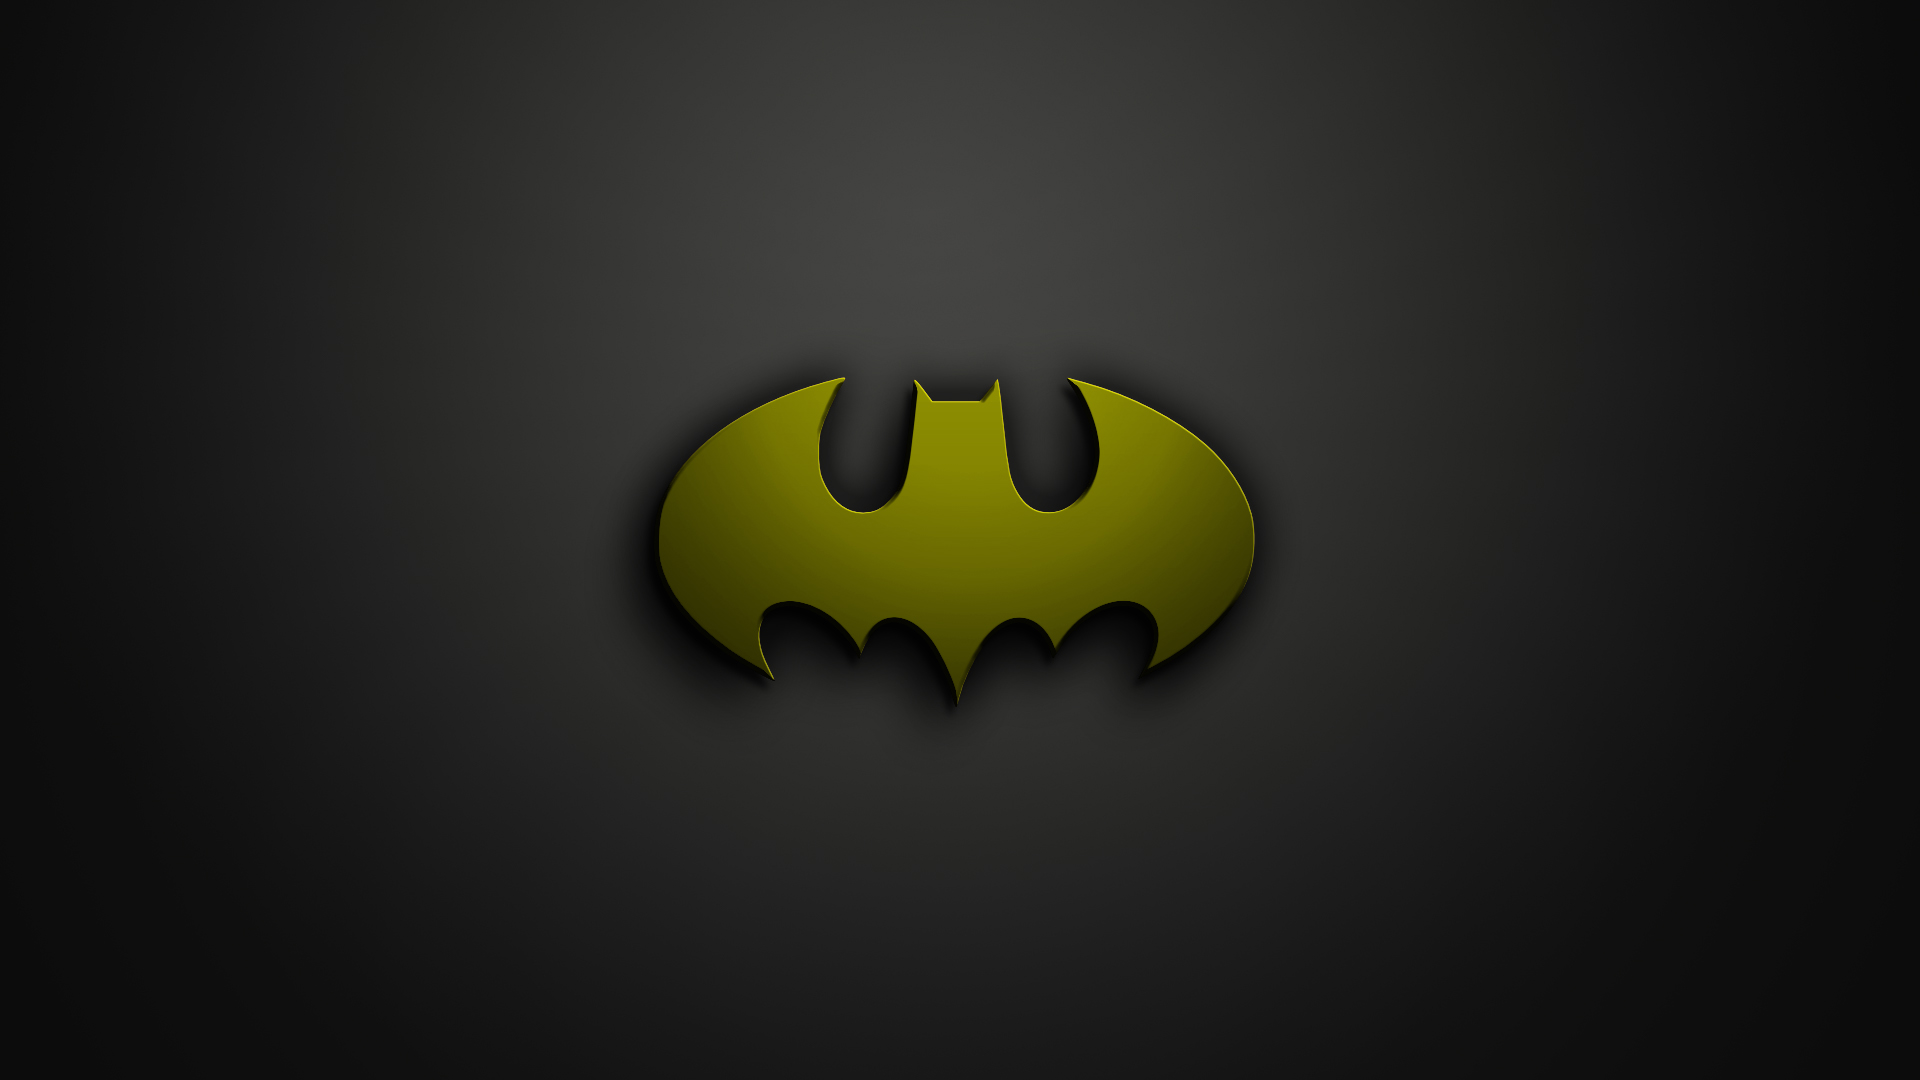 3d Windows Phone Wallpaper 50 Batman Logo Wallpapers For Free Download Hd 1080p